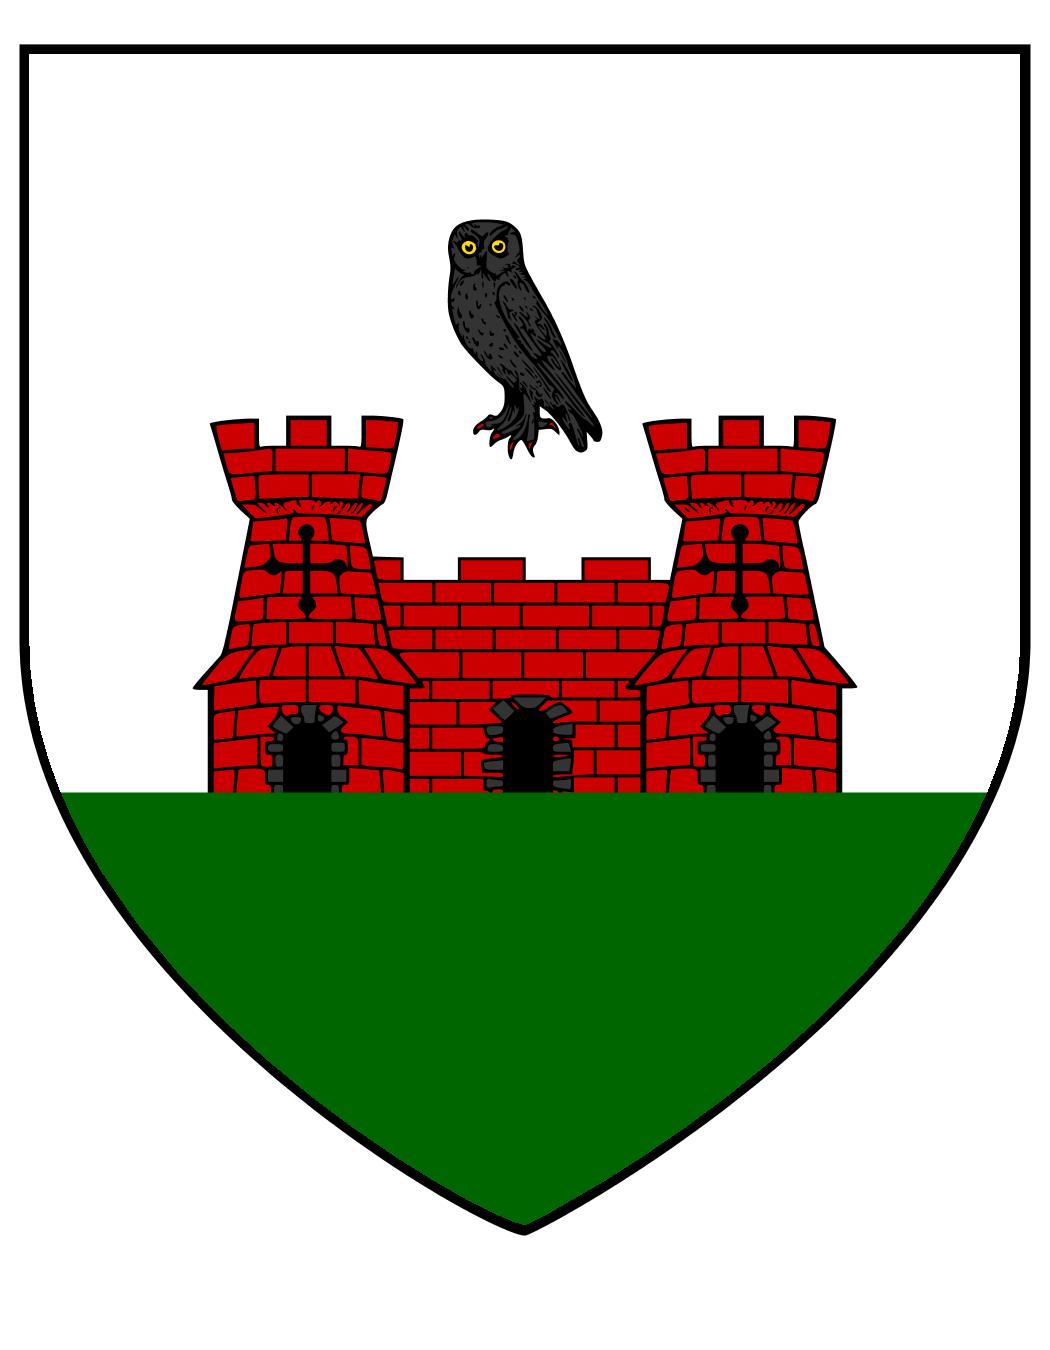 coat_of_arms_Johanna_of_Bernberg.png